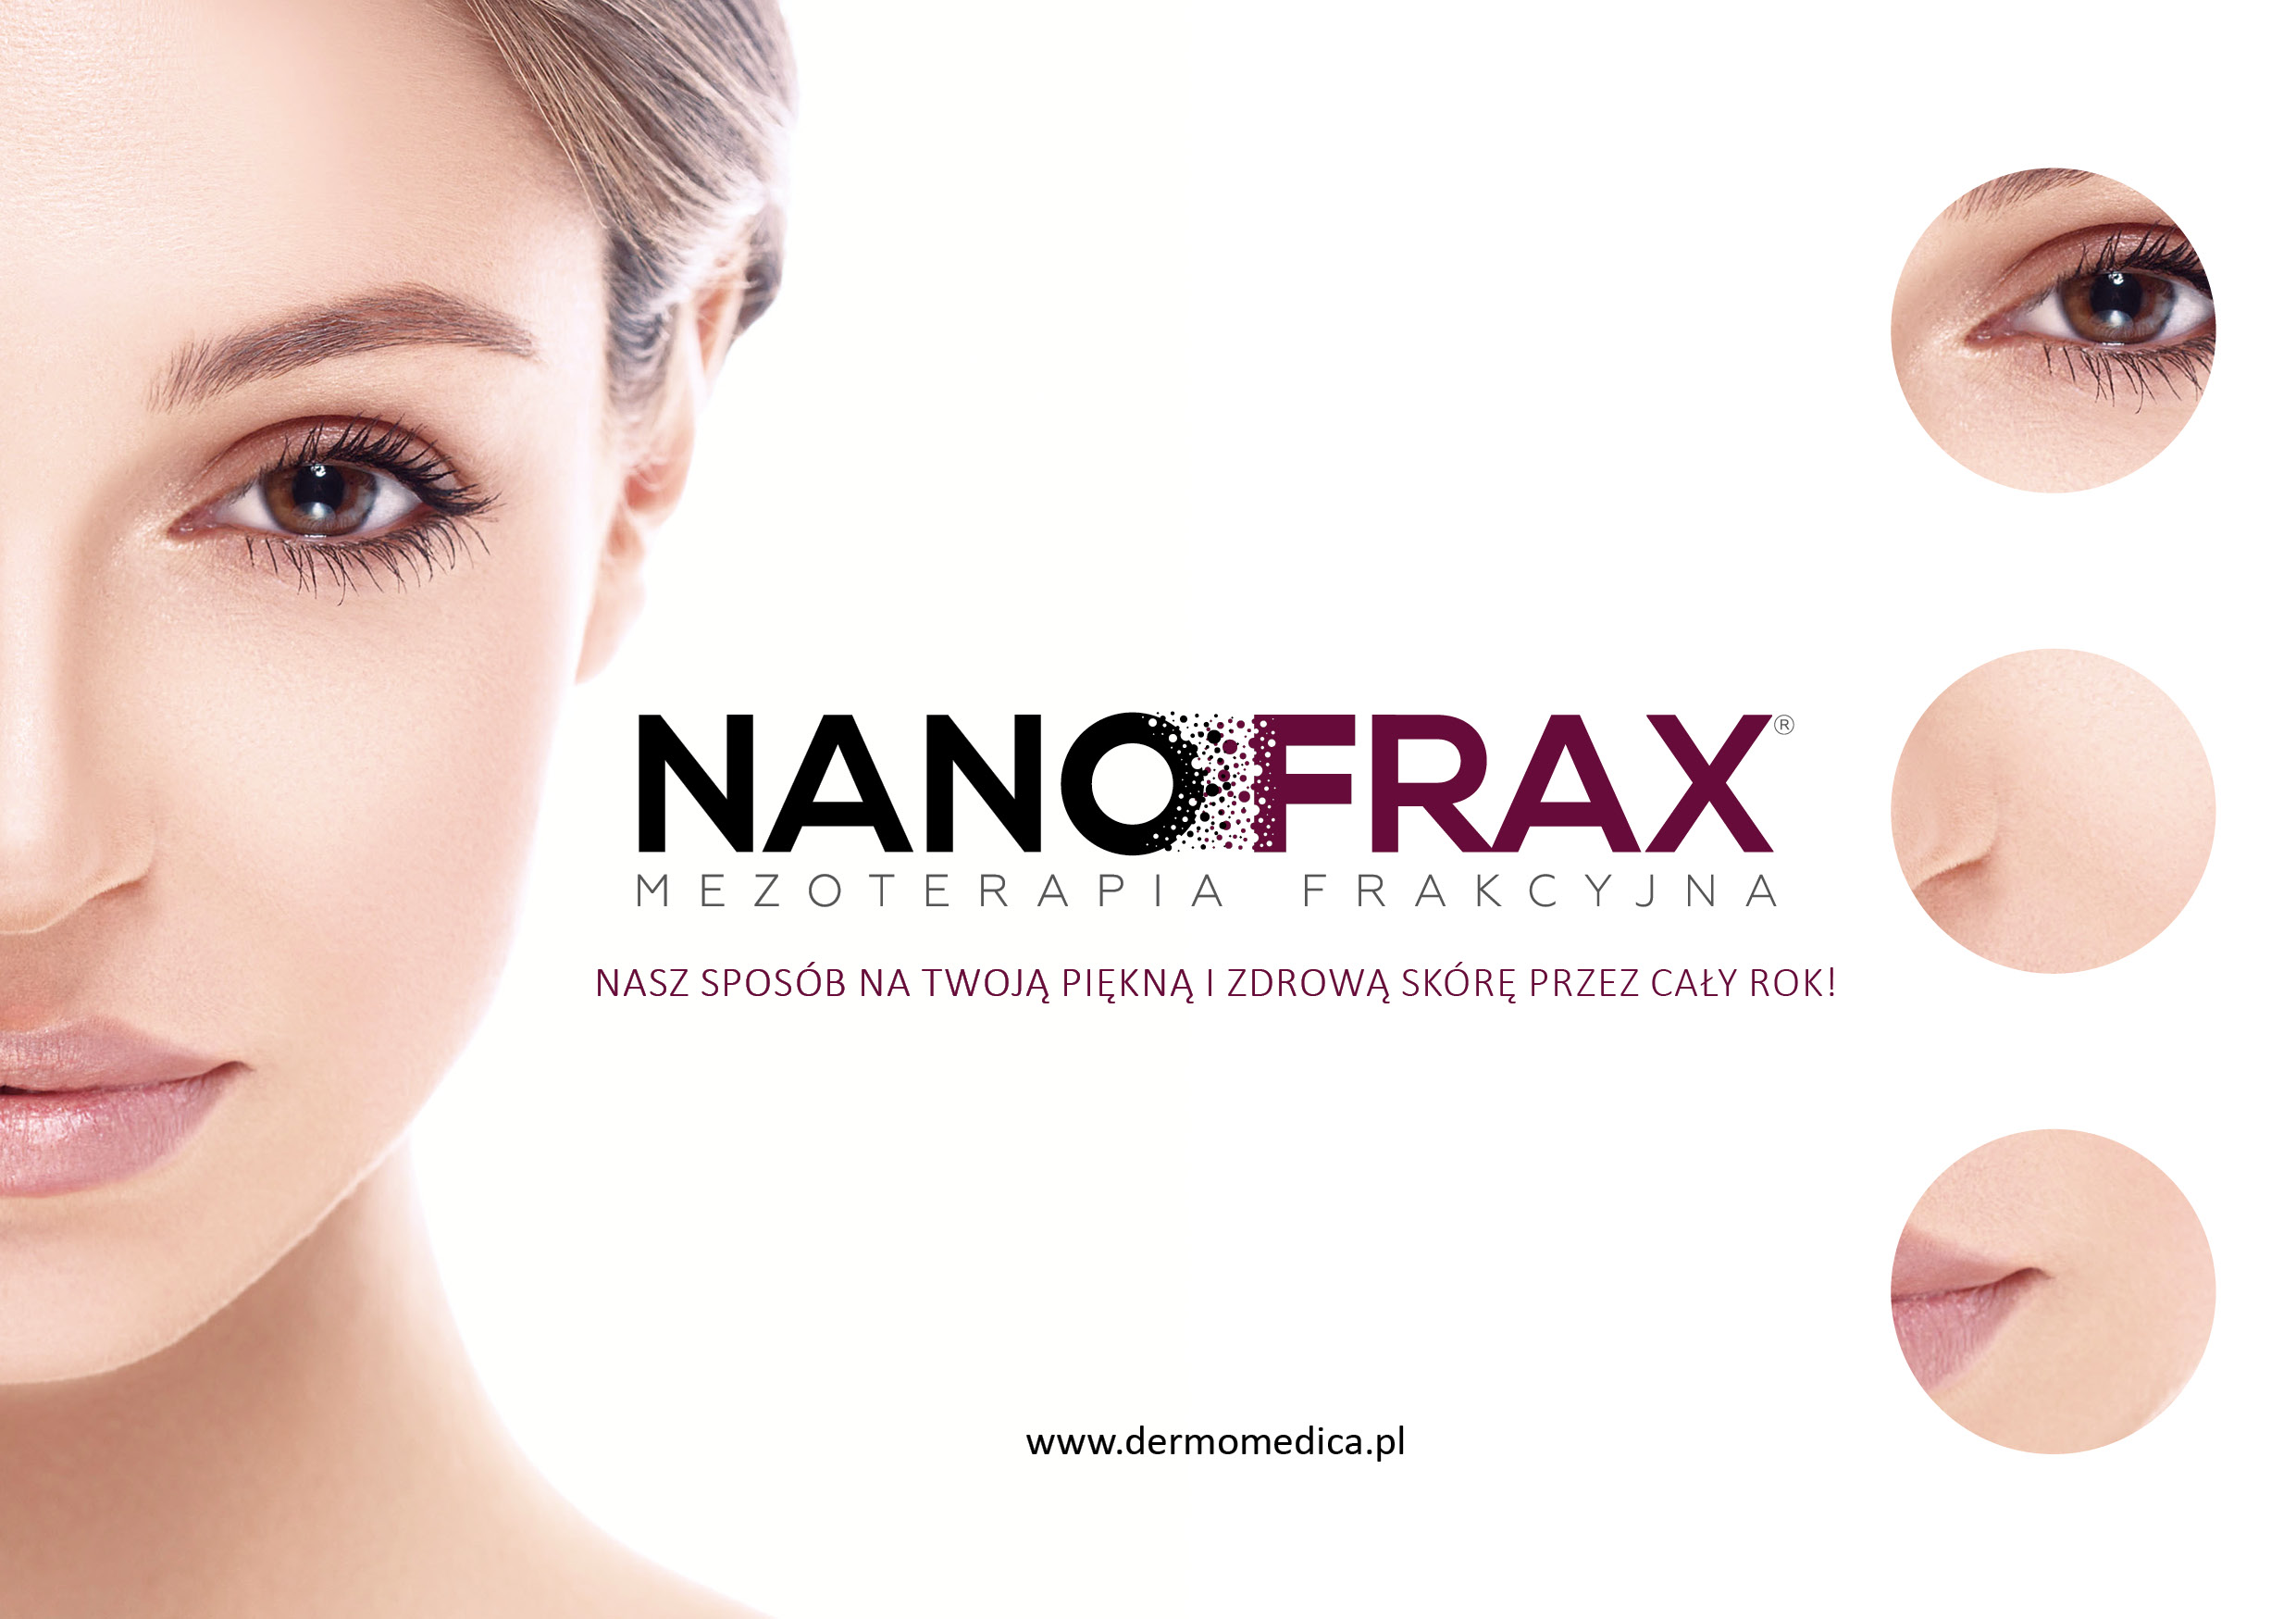 Dermomedica NanoFrax ulotka A5